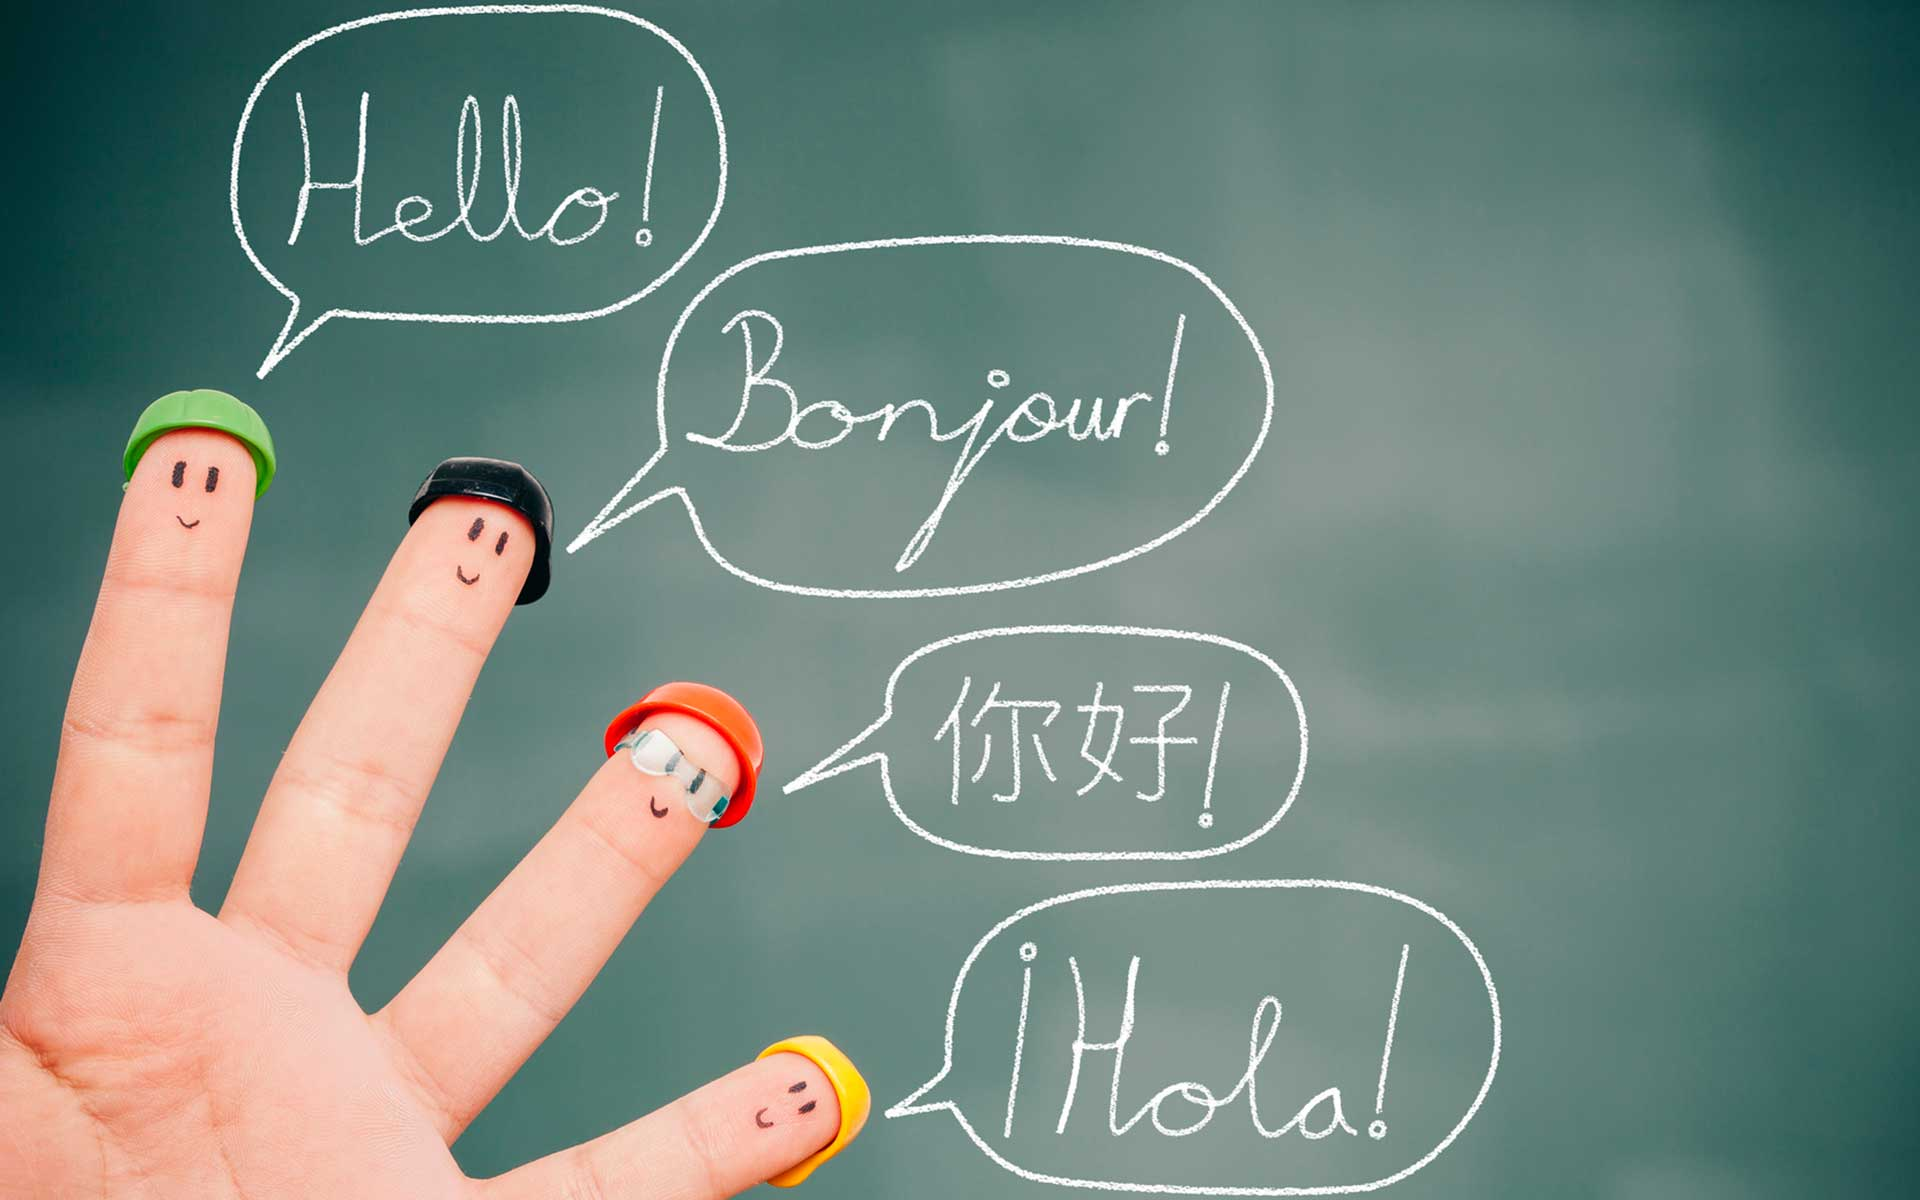 aula de idiomas empresa de formacion online – academia online de idioma